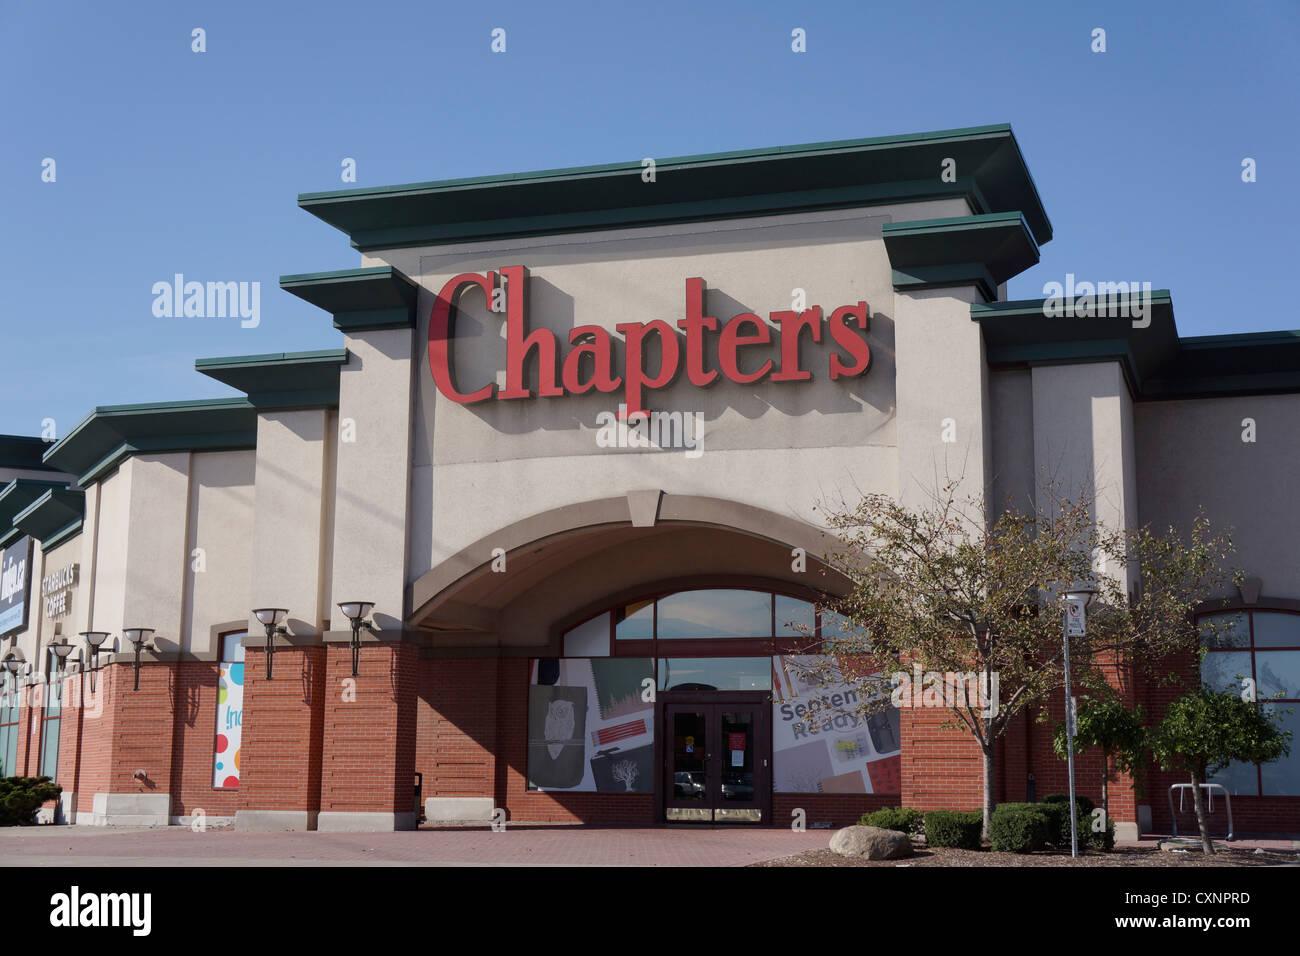 Chapters, Indigo Bookstore - Stock Image